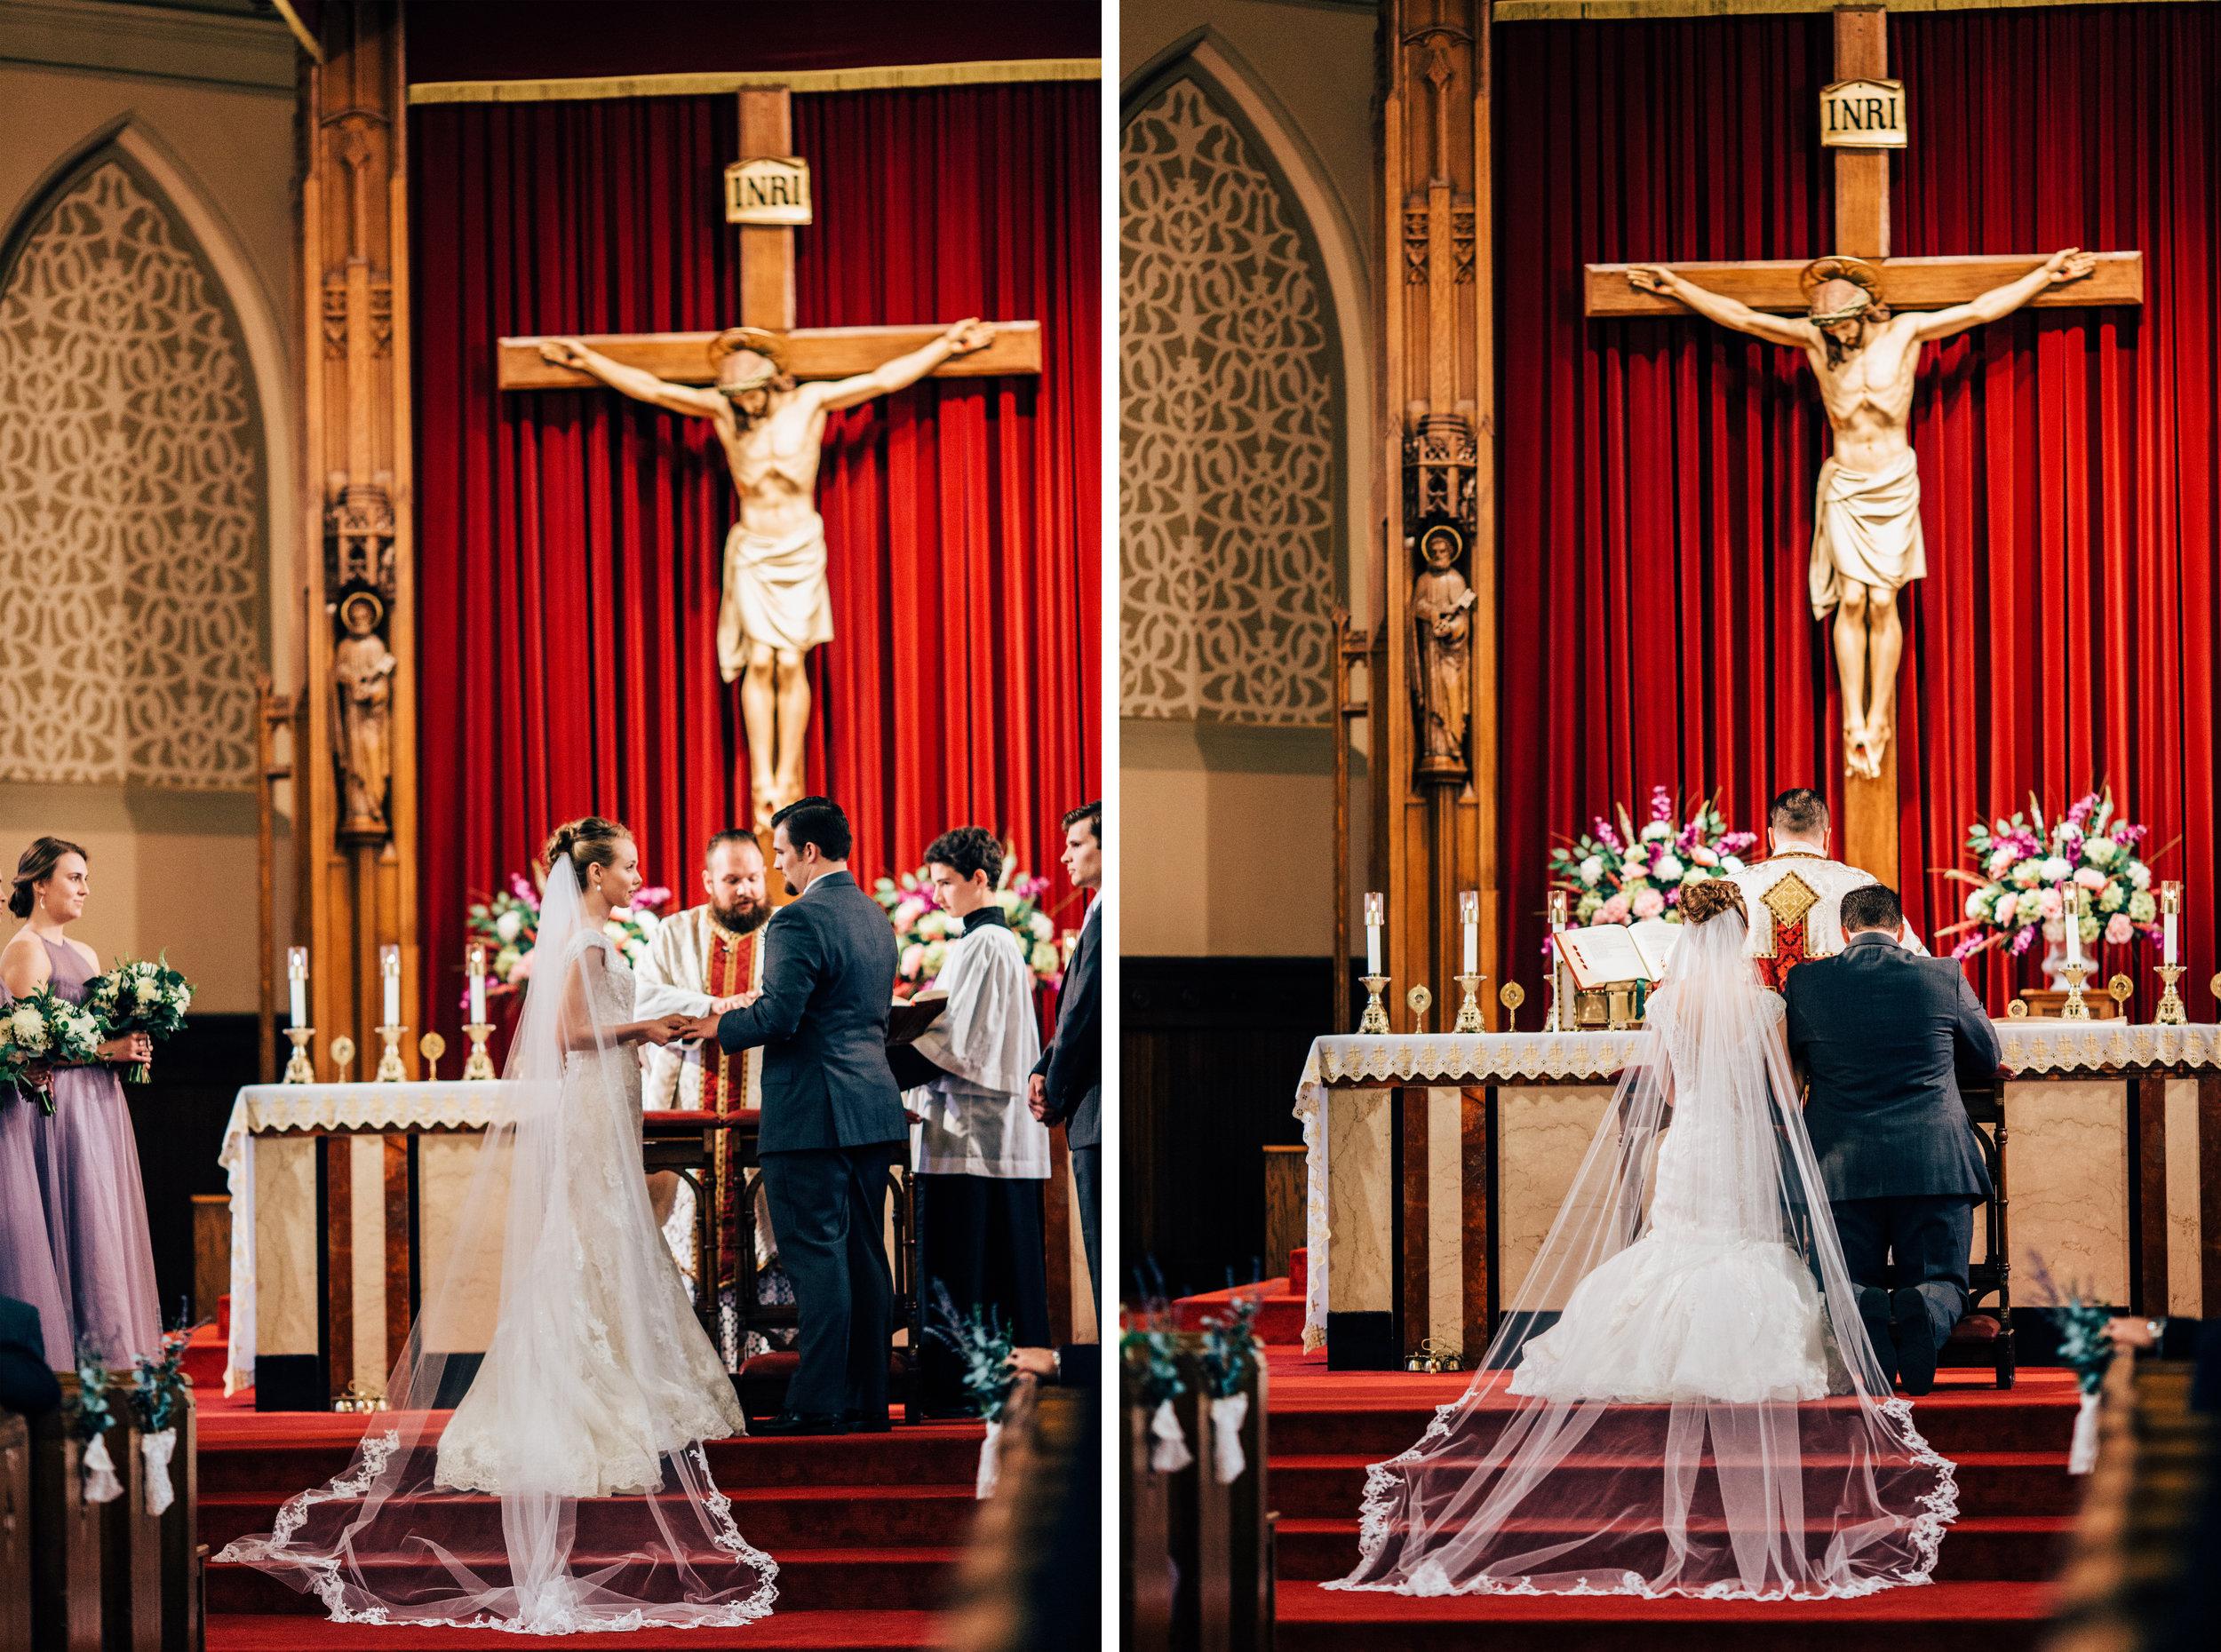 Ceremony-42 copy.jpg